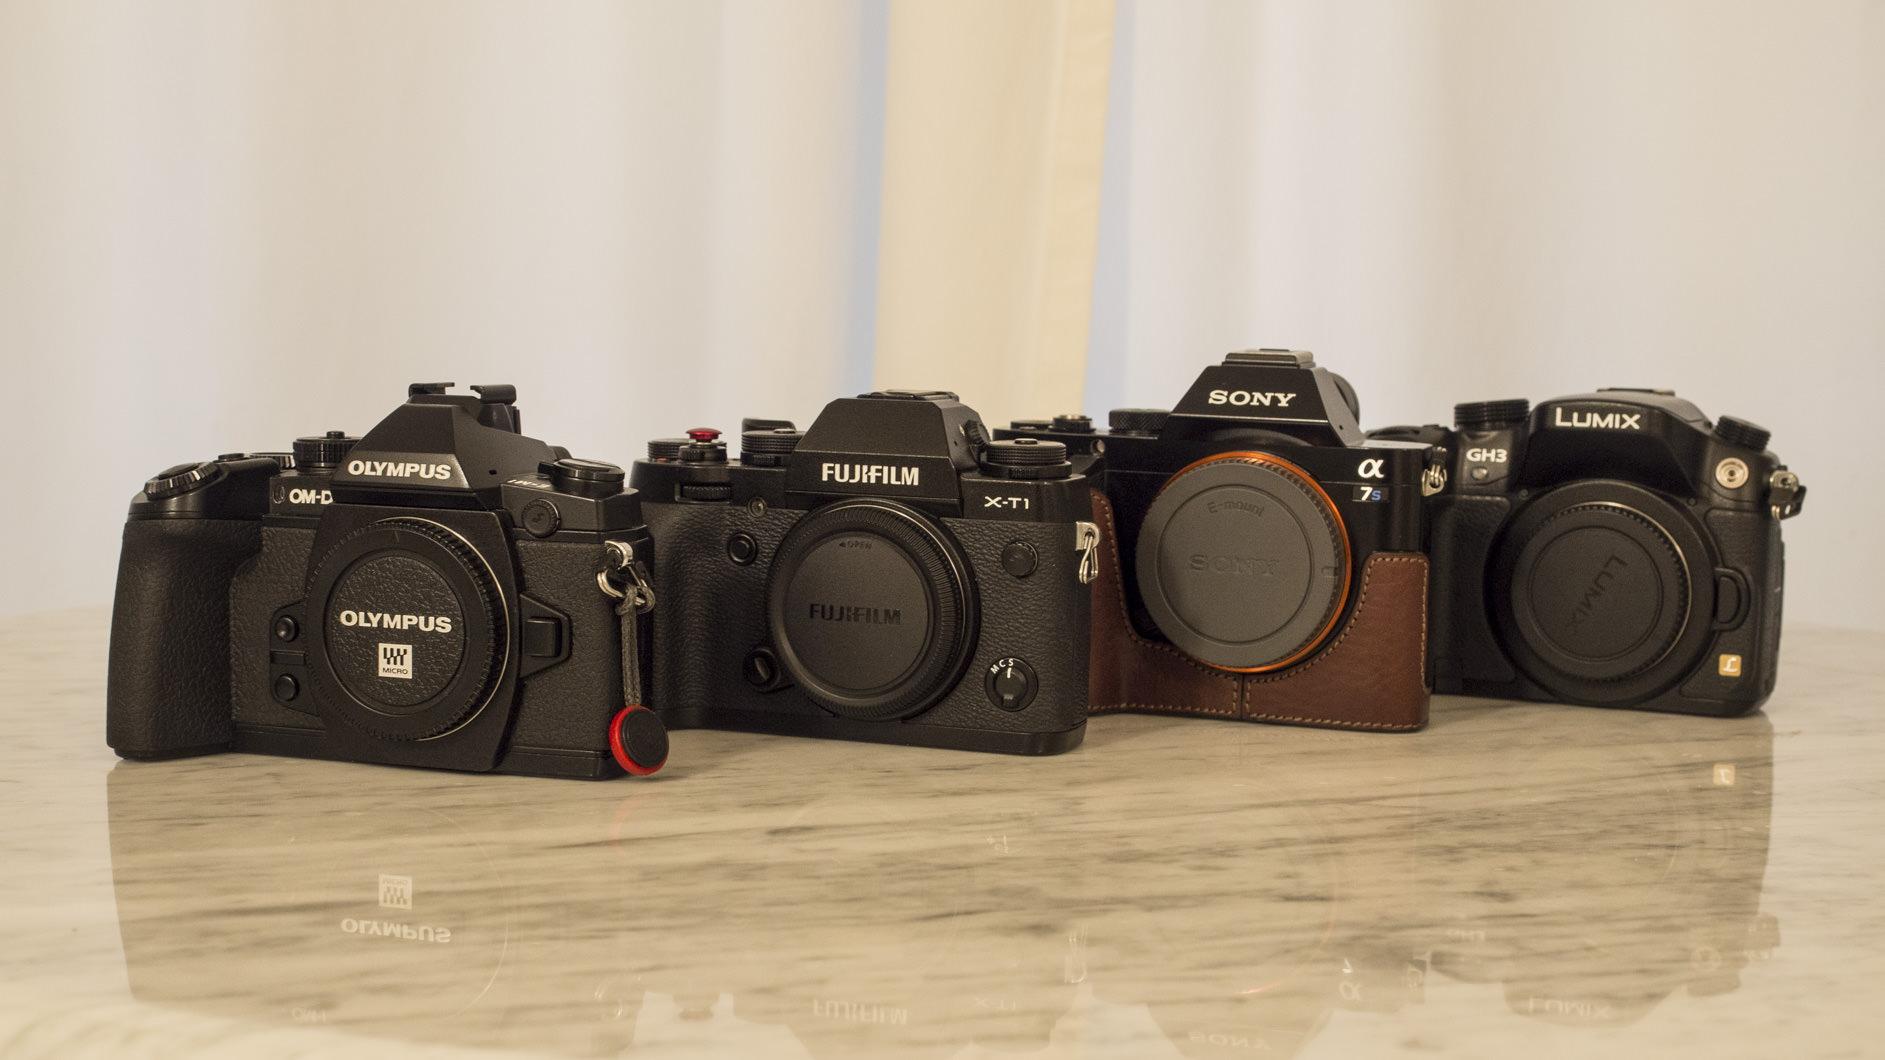 A Beginner's Guide to Choosing a Mirrorless Camera